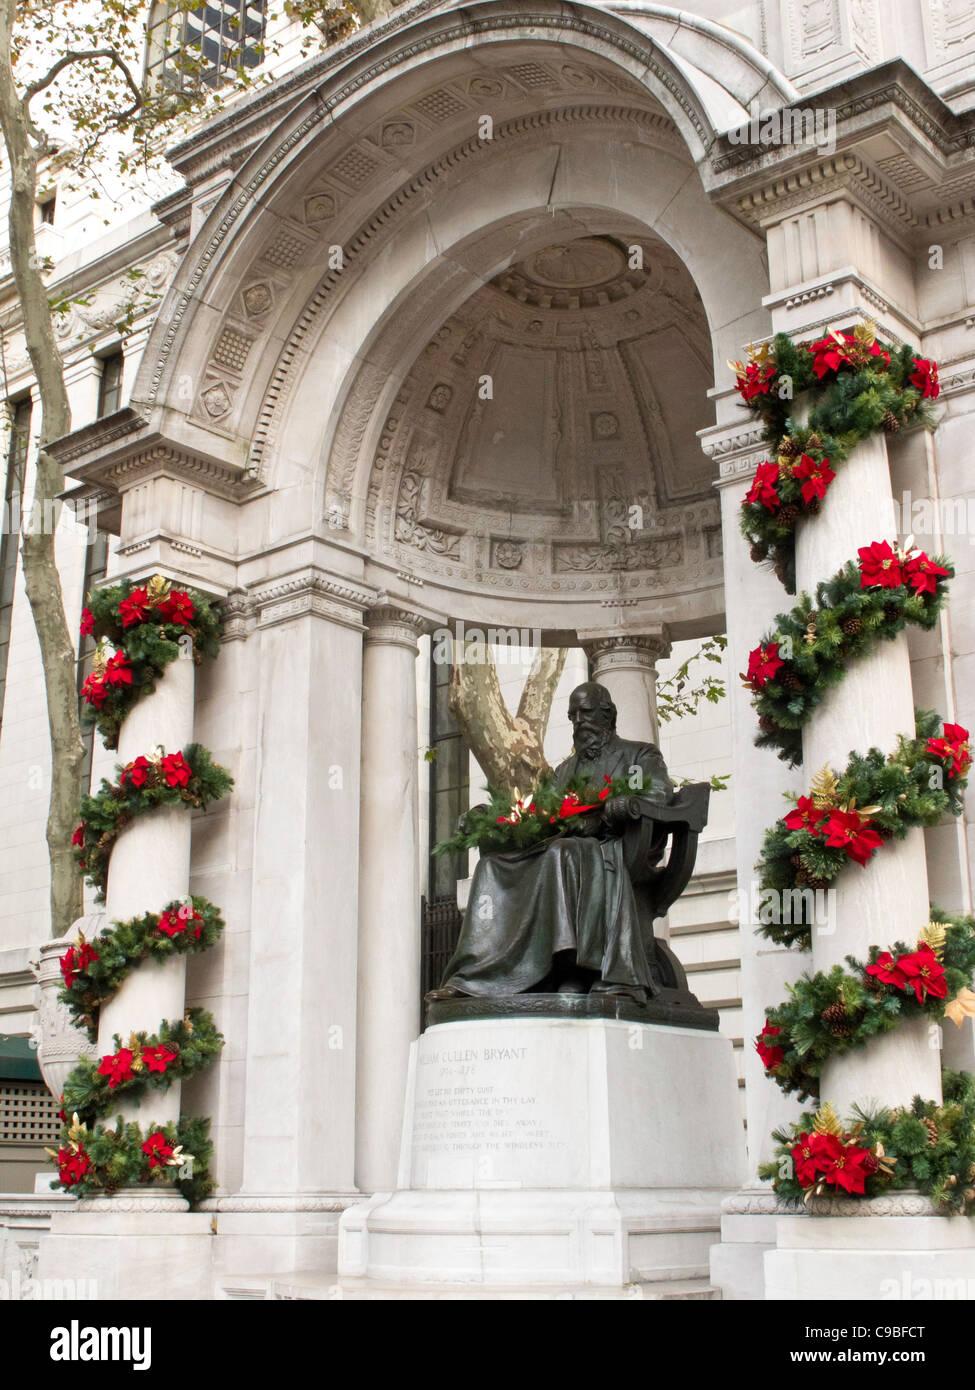 William Cullen Bryant Memorial, Bryant Park, NYC - Stock Image